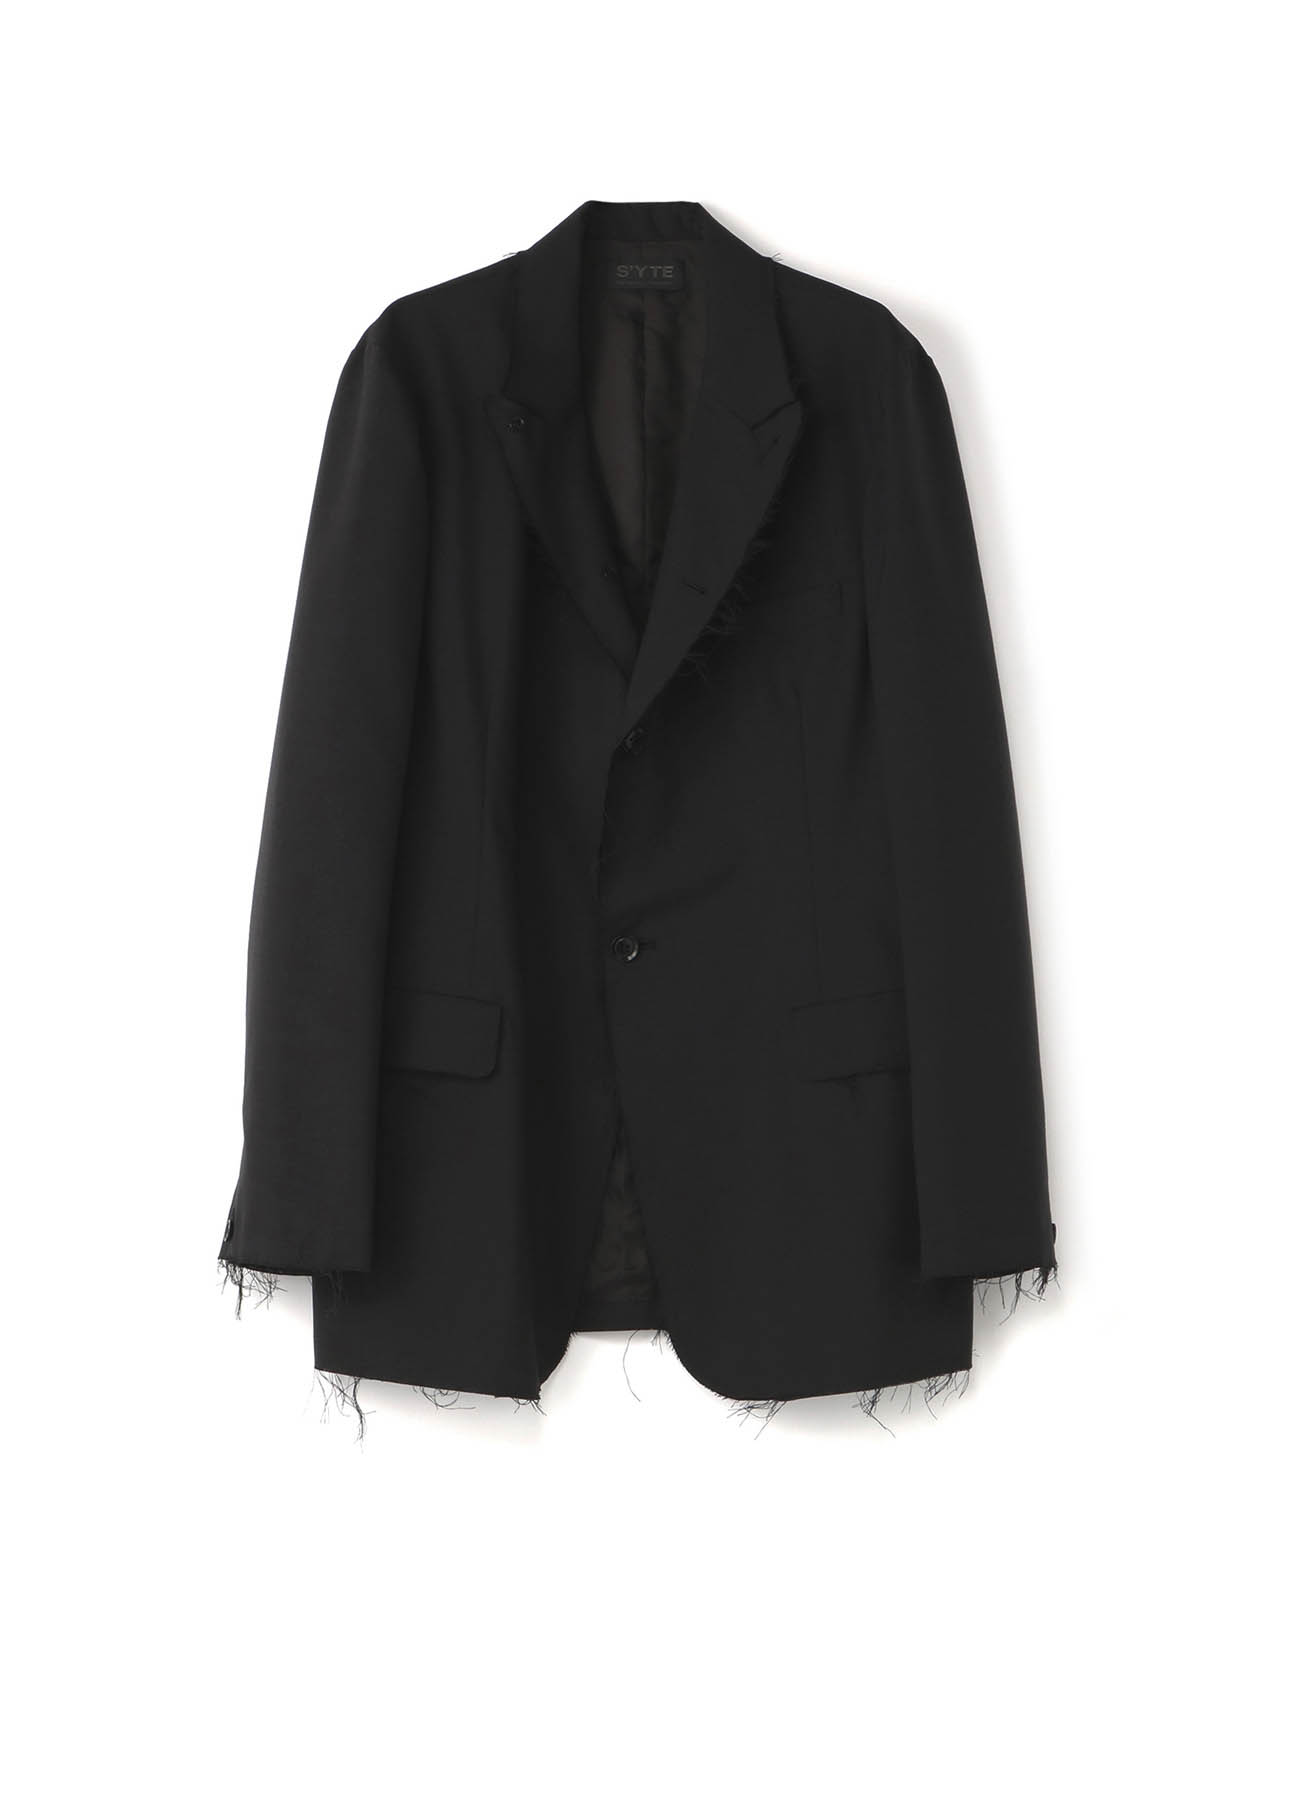 T/W Tropical Peaked Lapel Jacket